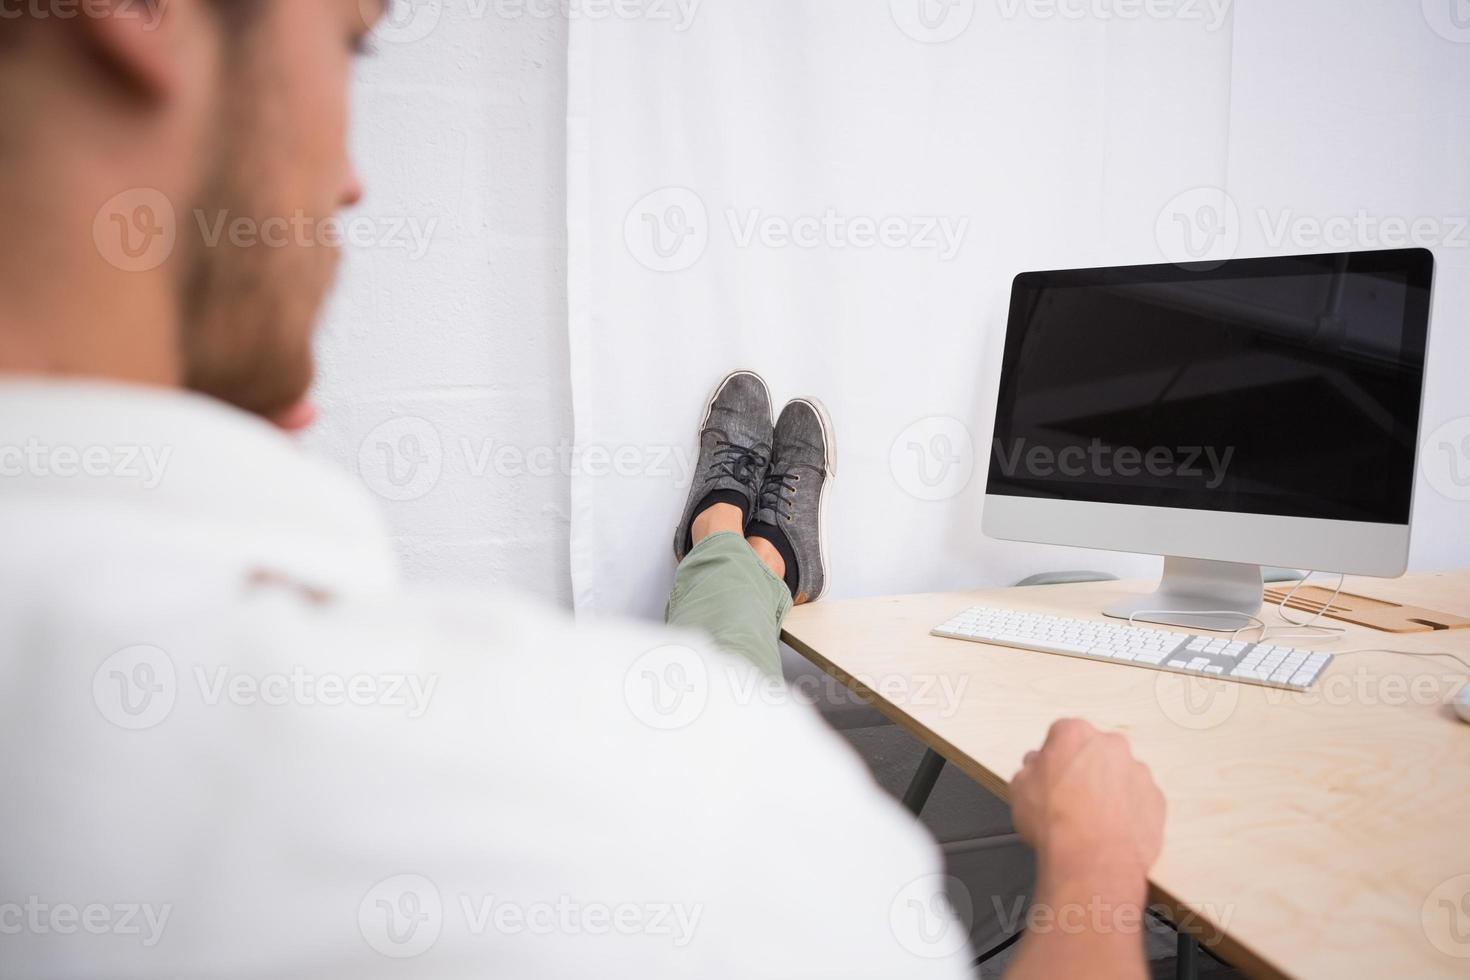 affärsman med benen korsade vid fotleden på kontorsskrivbordet foto